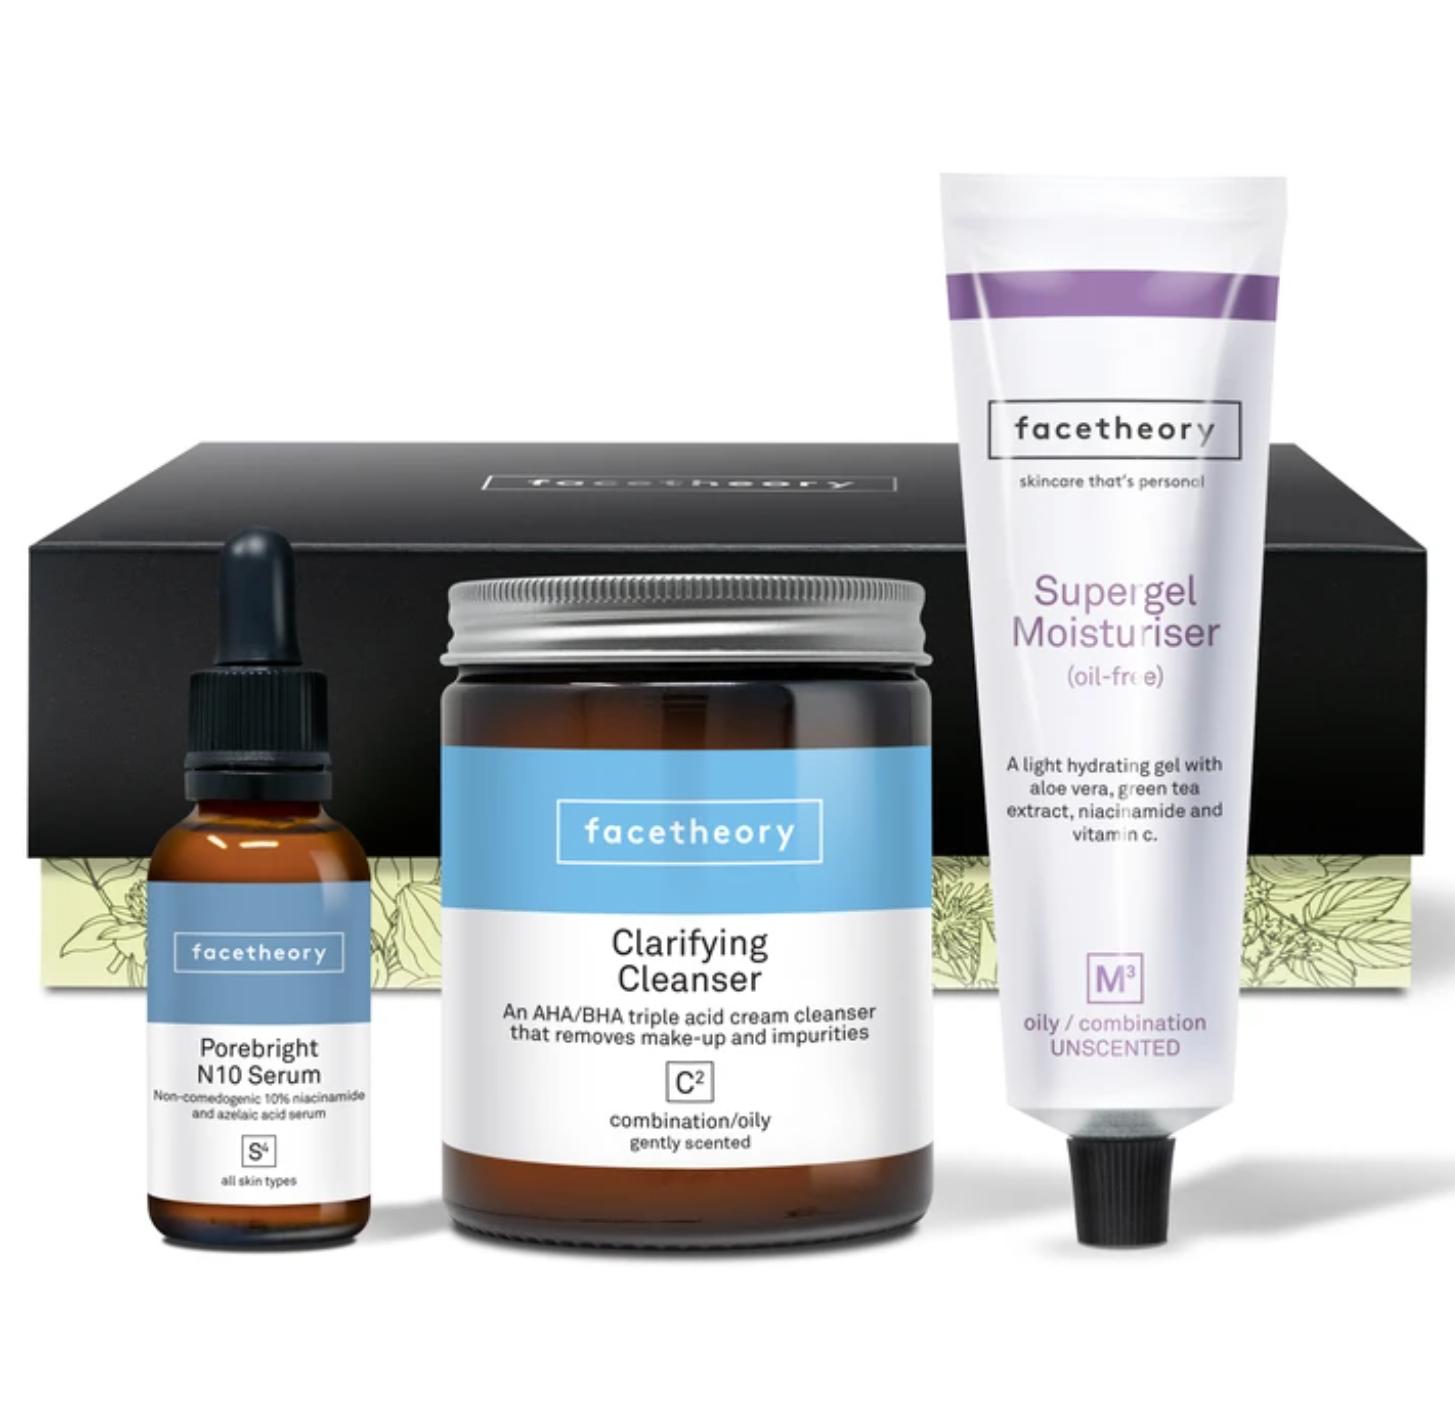 Facetheory: 20% Off Skincare Sets